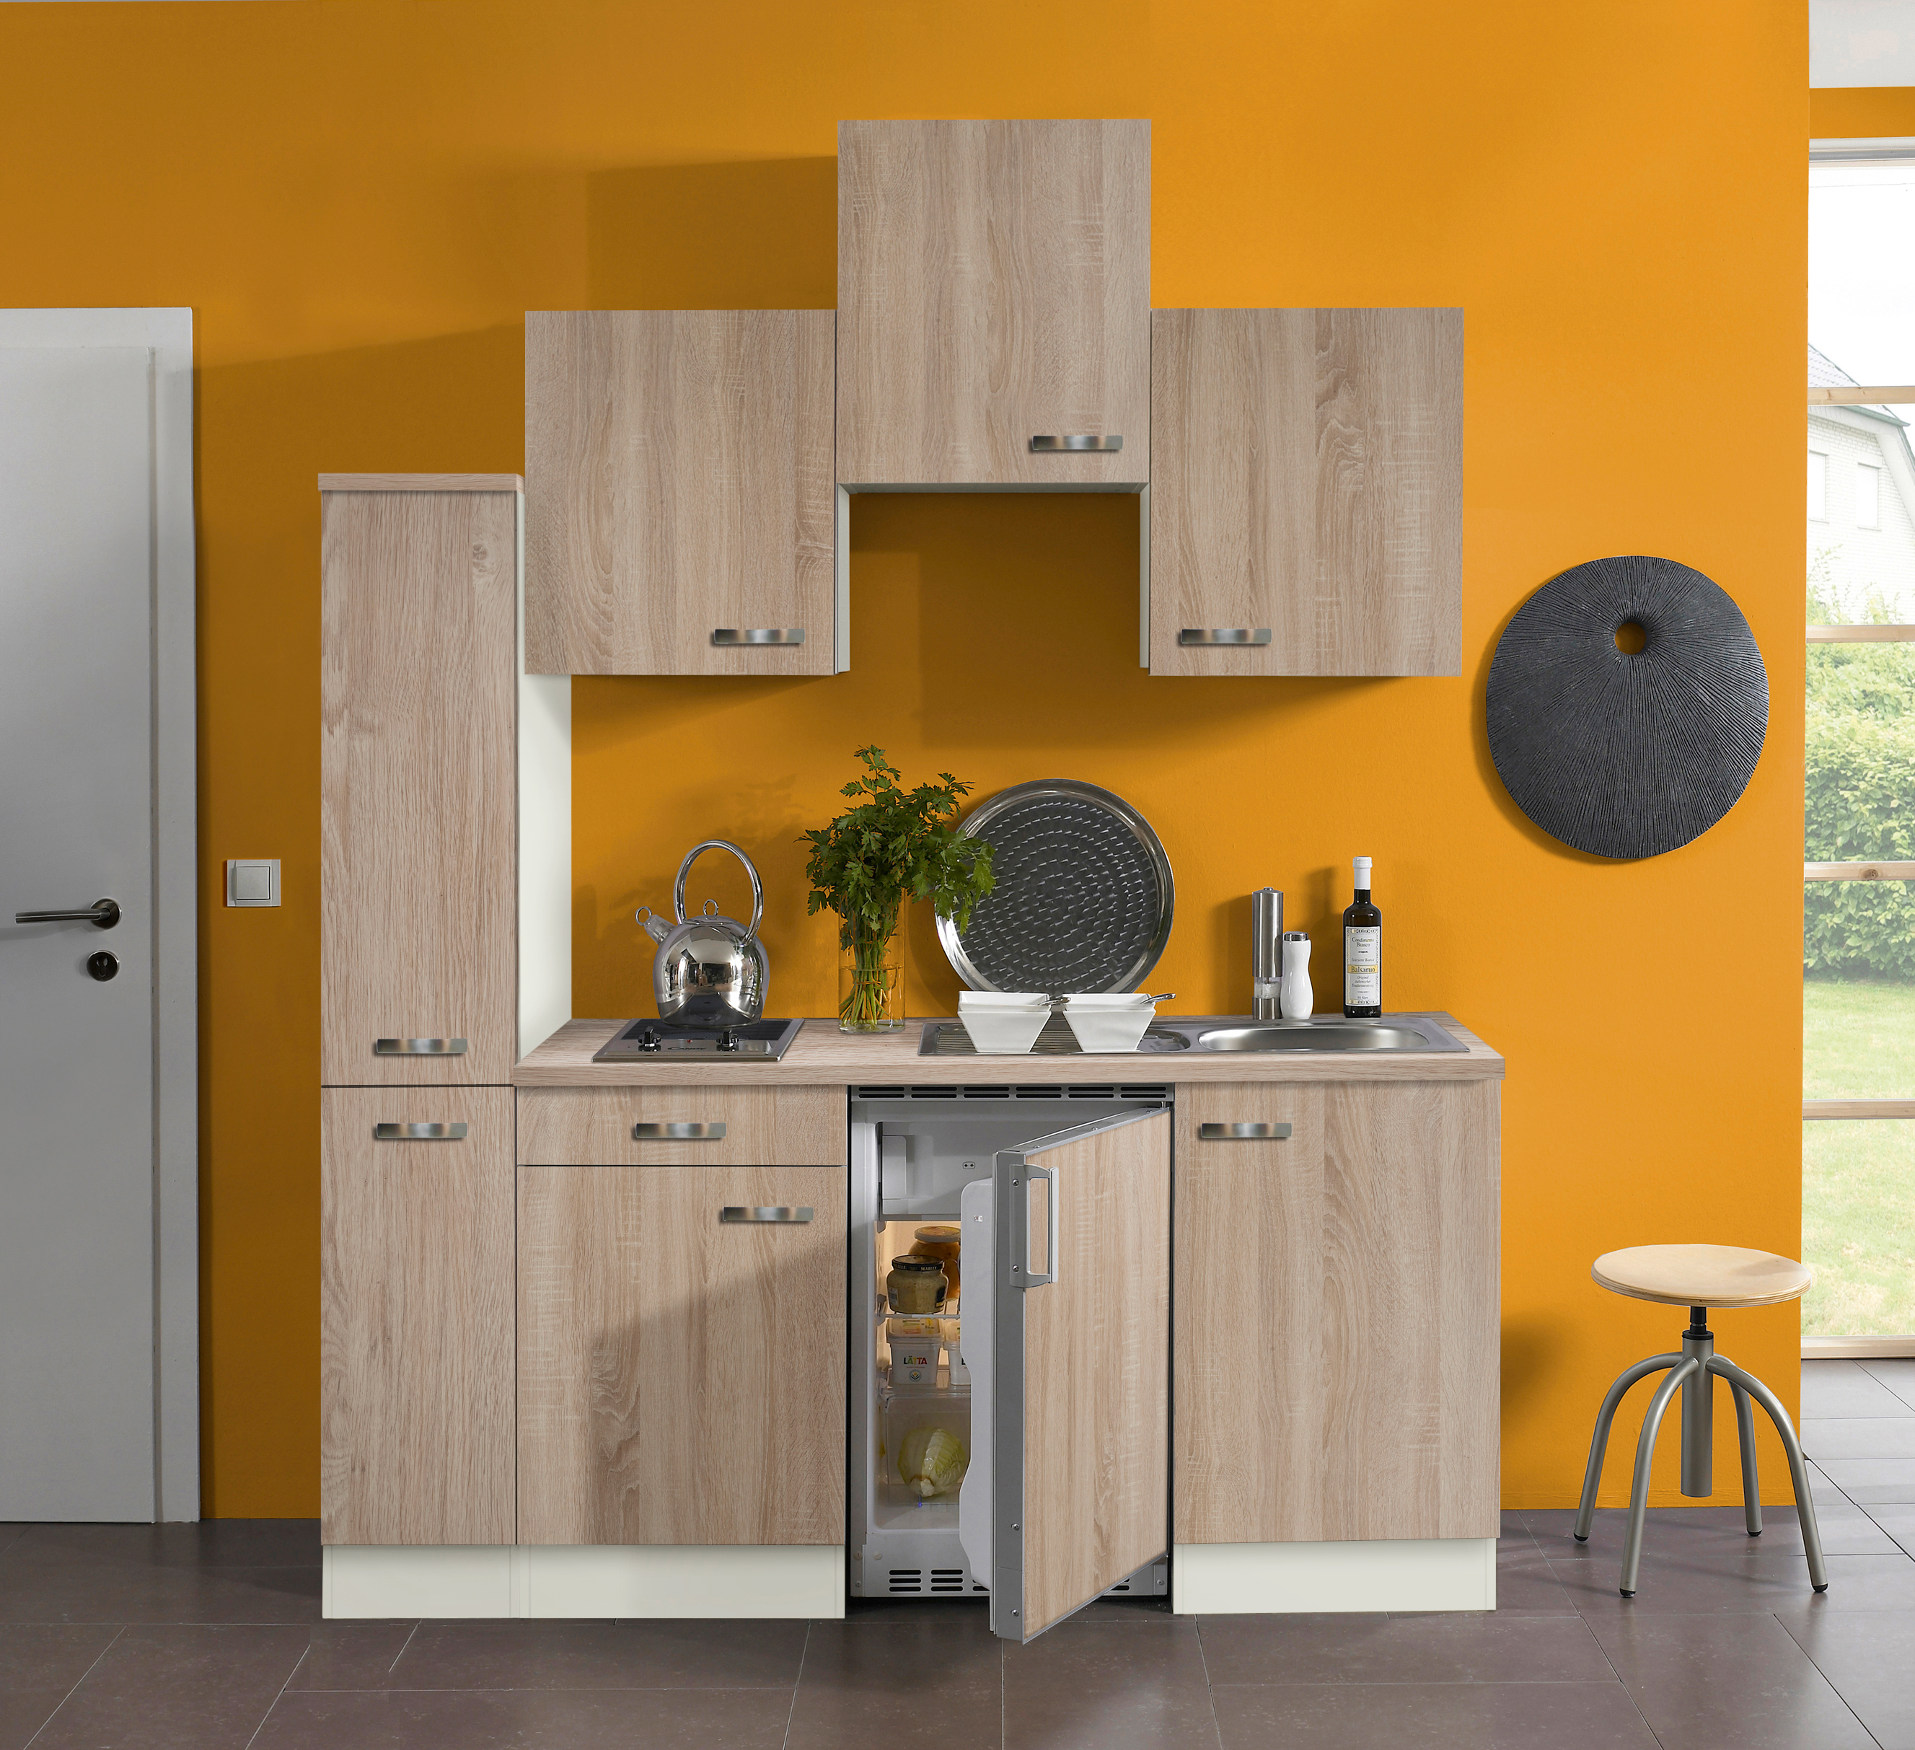 singlek che toledo vario 1 glaskeramik kochfeld breite 180 cm eiche k che singlek chen. Black Bedroom Furniture Sets. Home Design Ideas